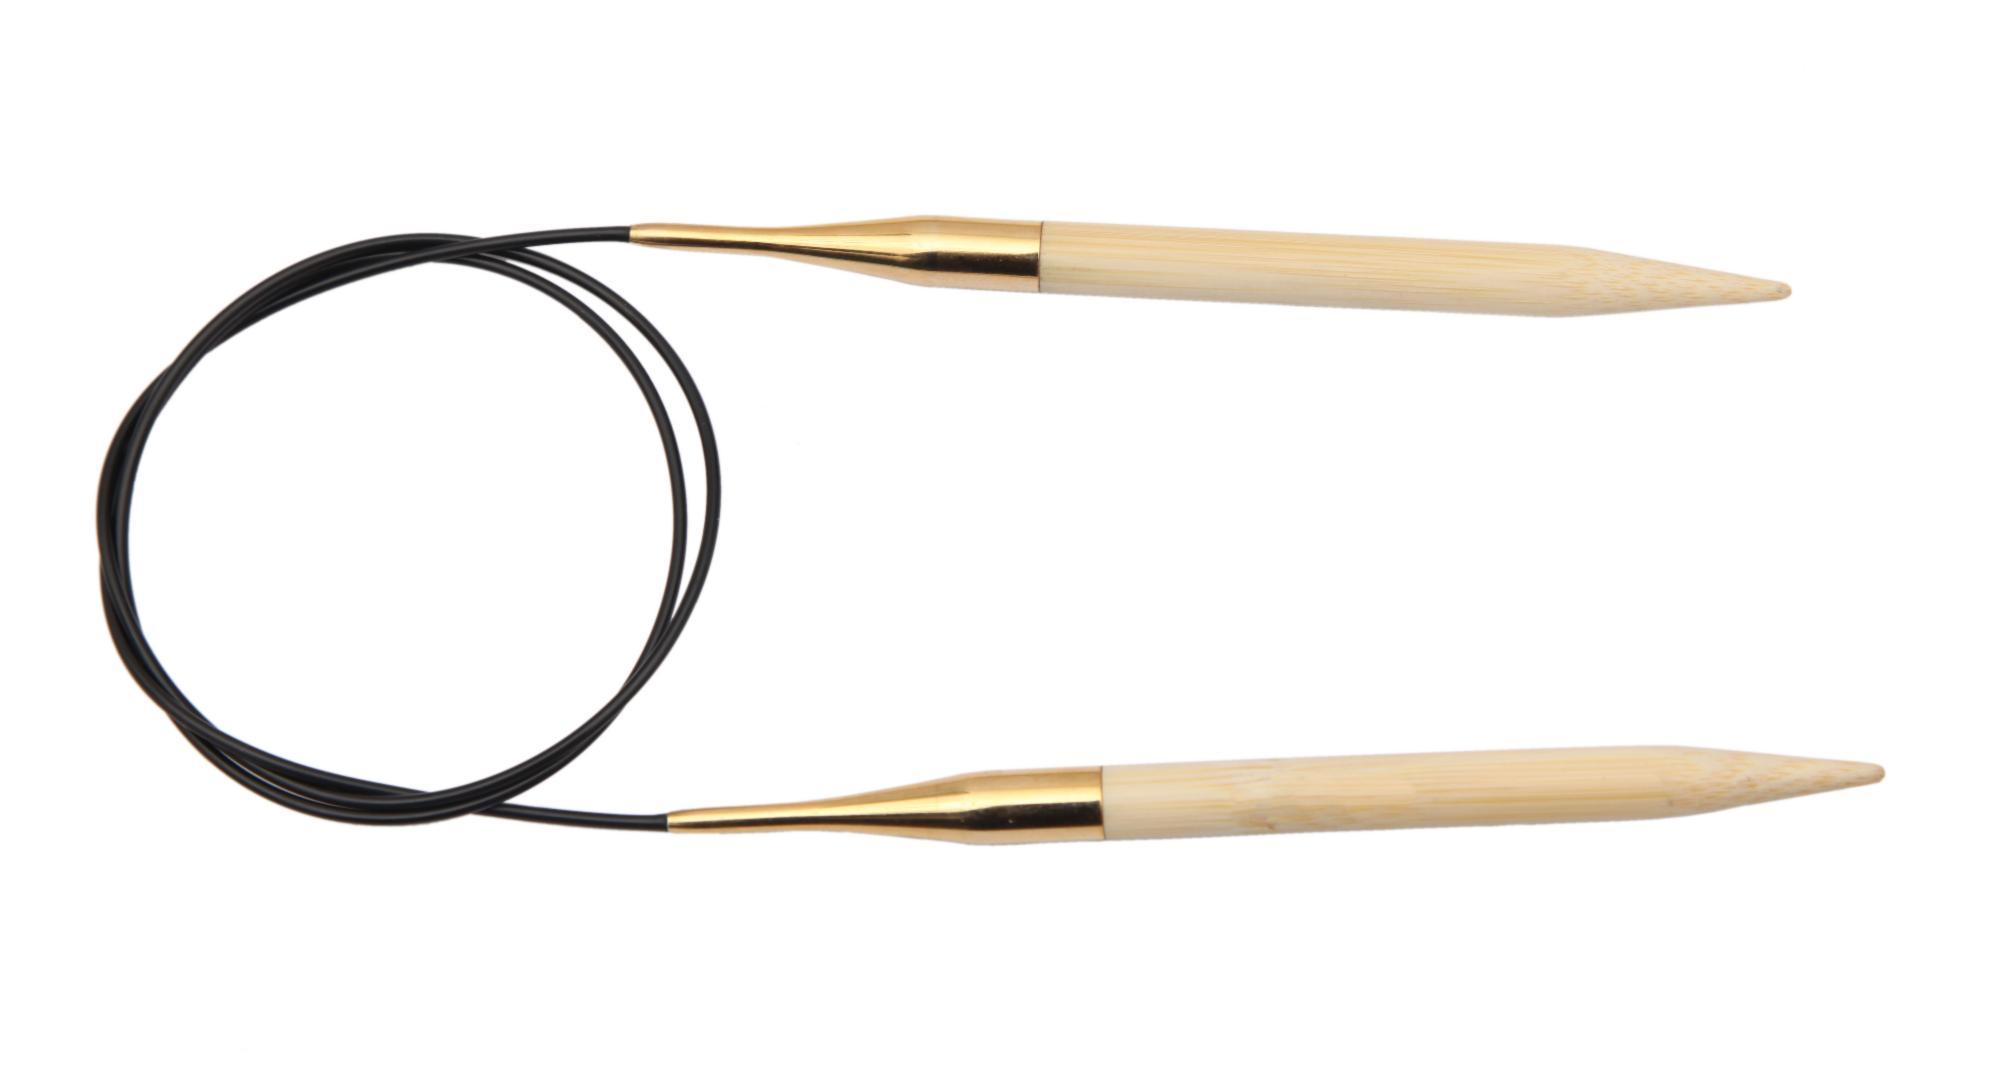 Спицы круговые 40 см Bamboo KnitPro, 22215, 3.25 мм